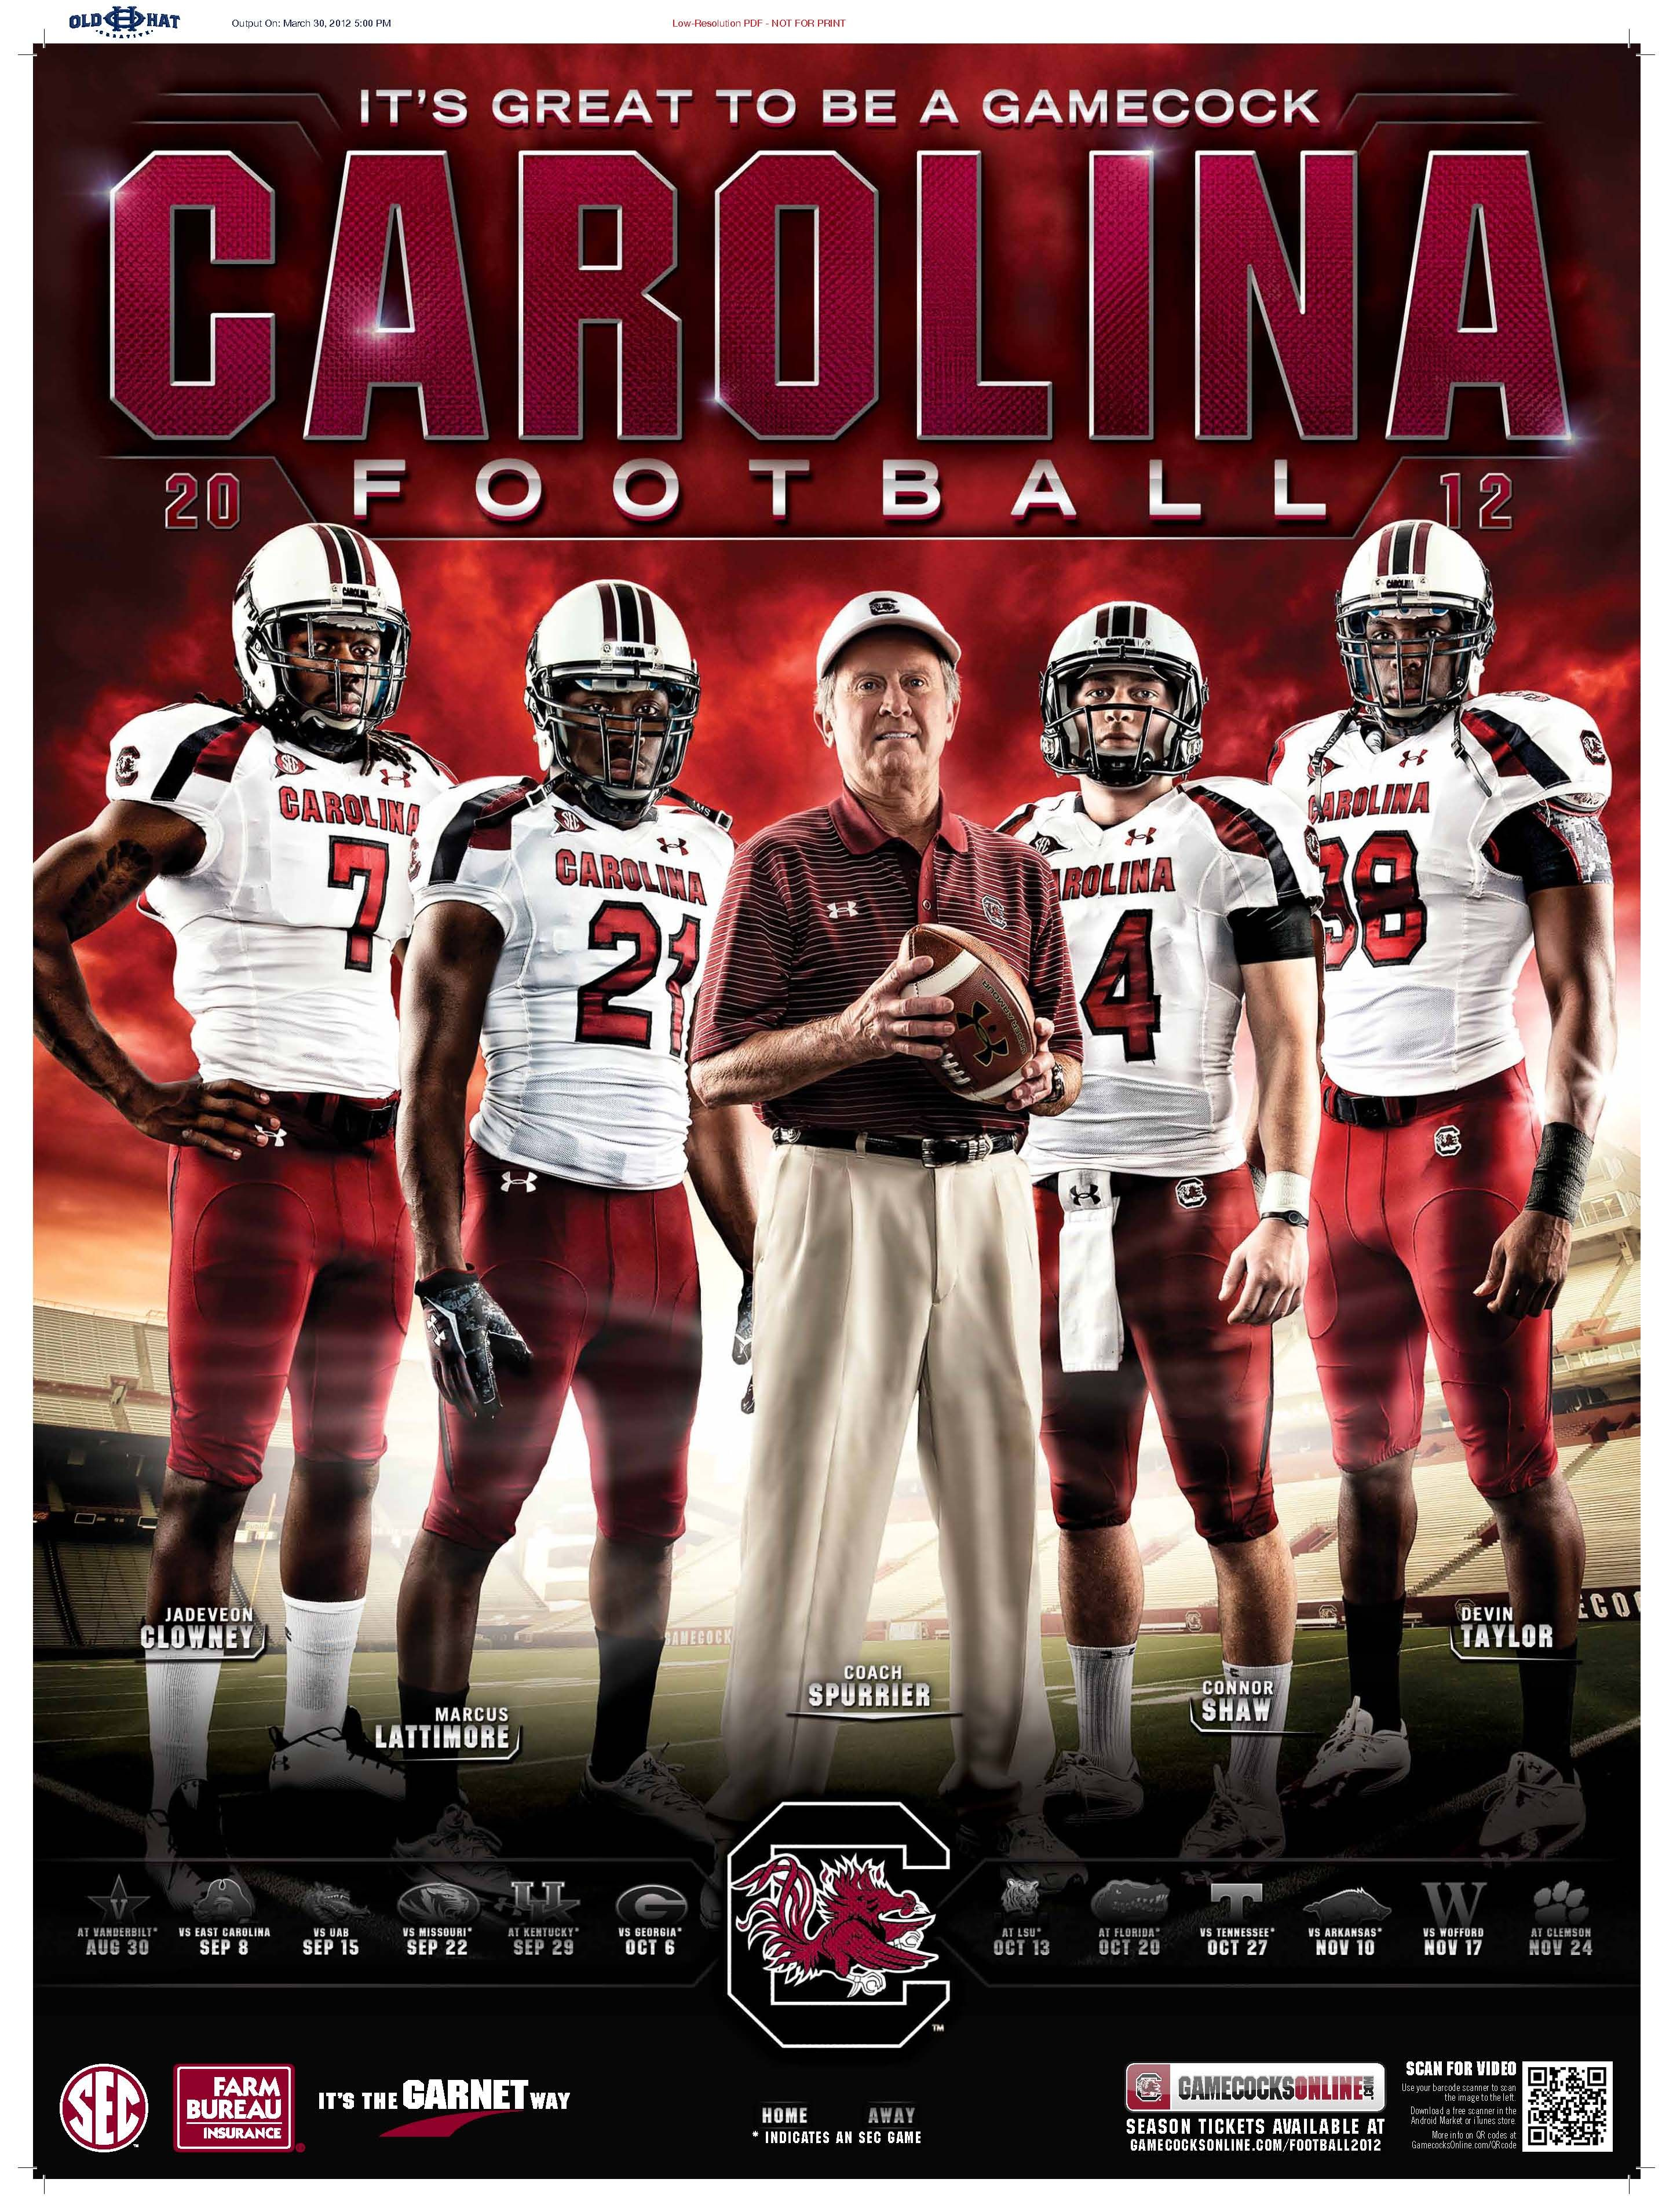 2012 football poster carolina gamecocks football south